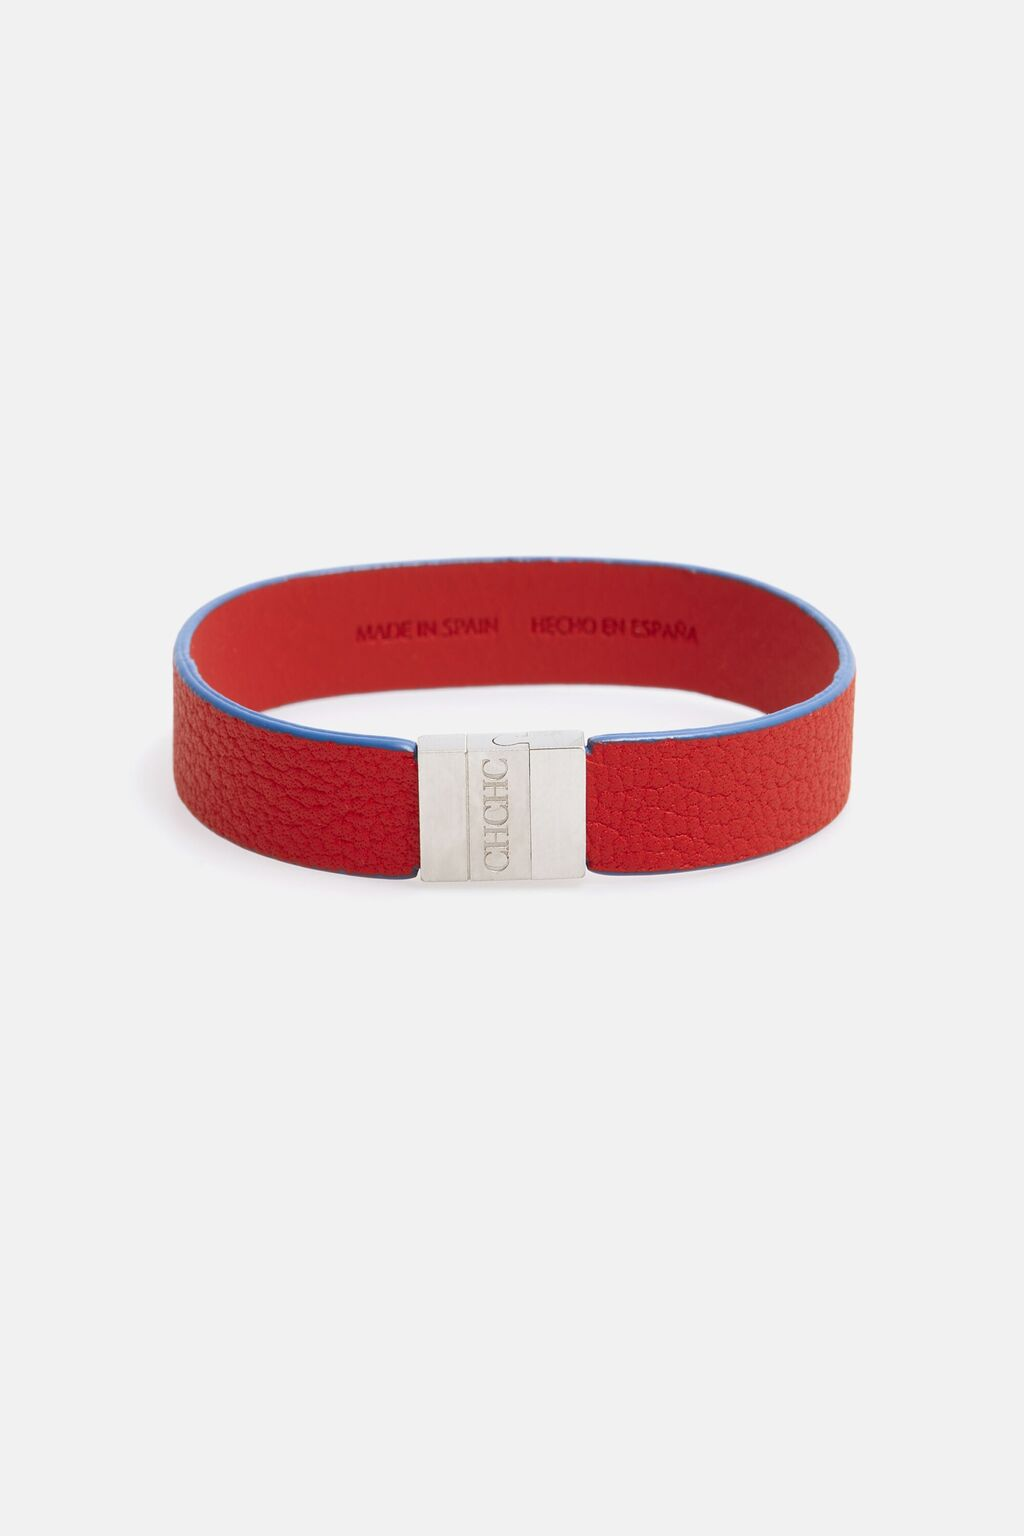 CH Magnet leather bracelet